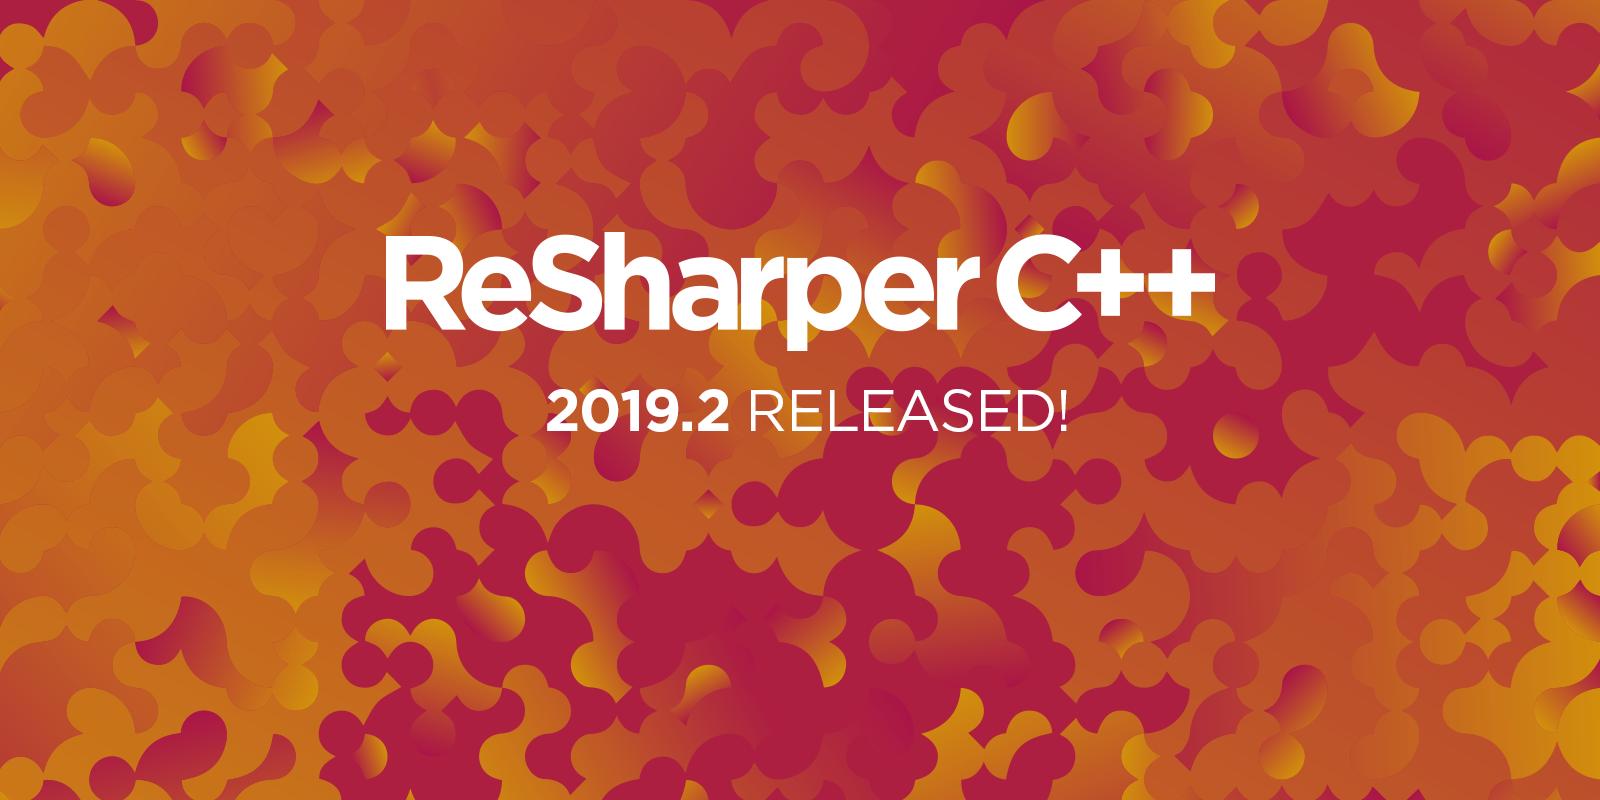 ReSharper C++ 2019.2 release